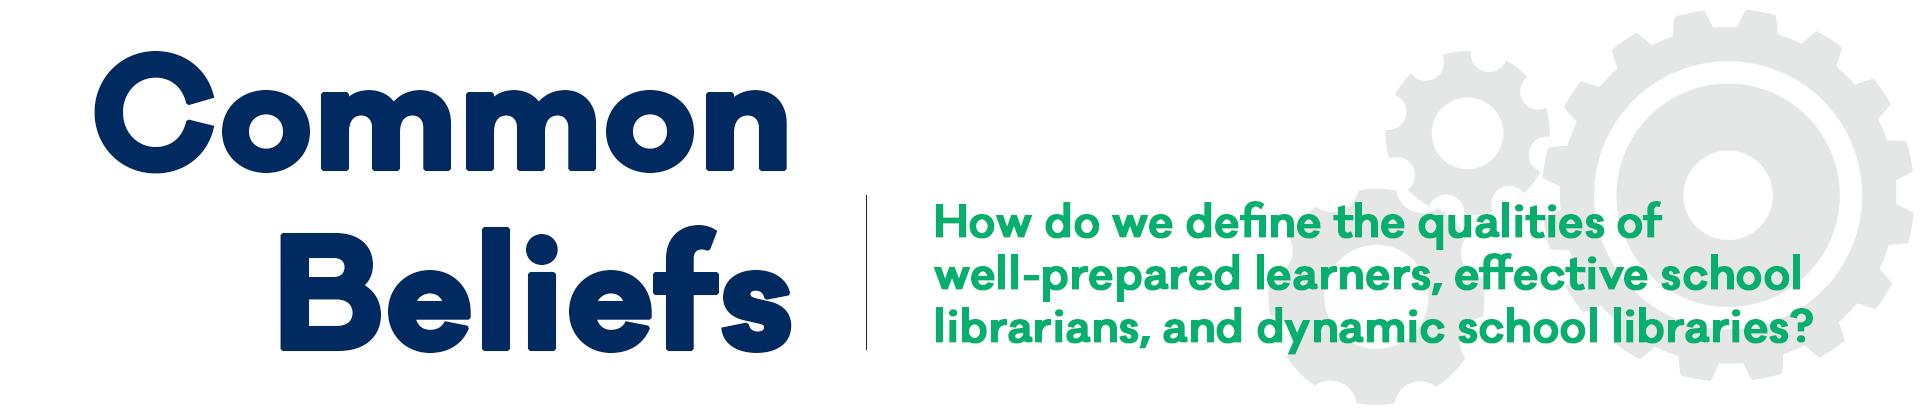 common beliefs national school library standards